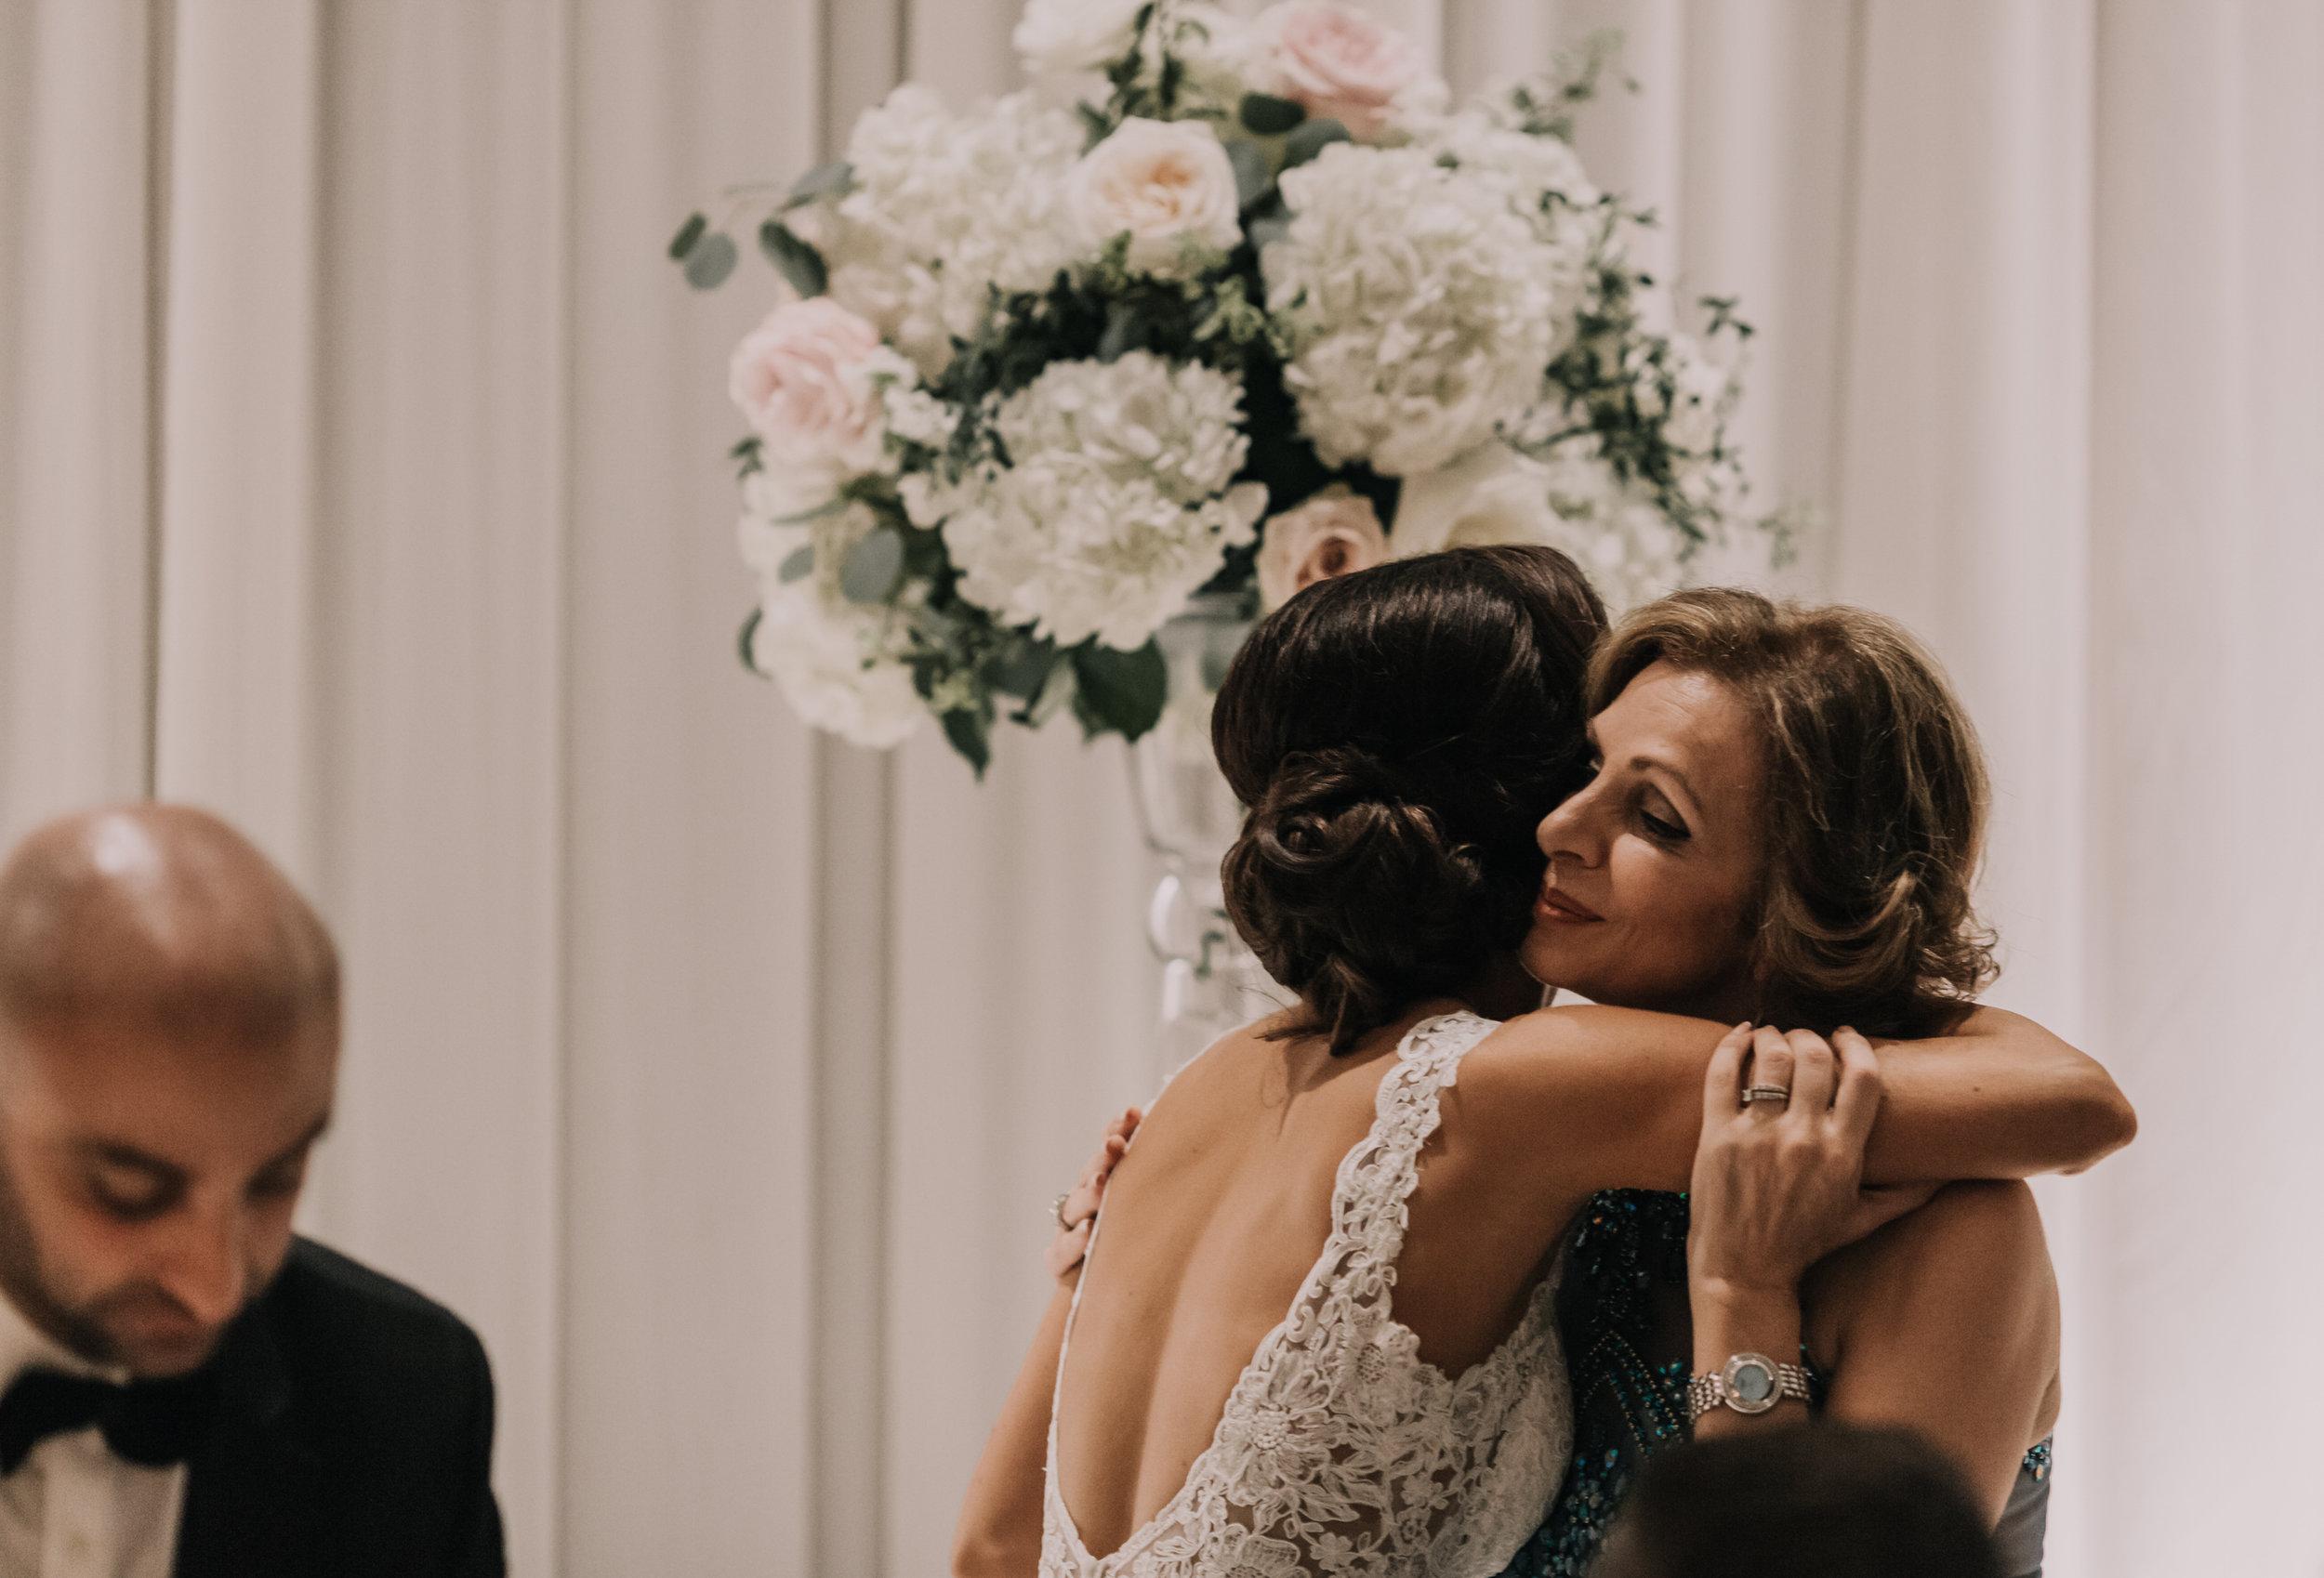 Pitt Meadows Wedding Photographer - Sky Hangar Wedding Photos - Vancouver Wedding Photographer & Videographer - Sunshine Coast Wedding Photos - Sunshine Coast Wedding Photographer - Jennifer Picard Photography - IMG_6370.jpg